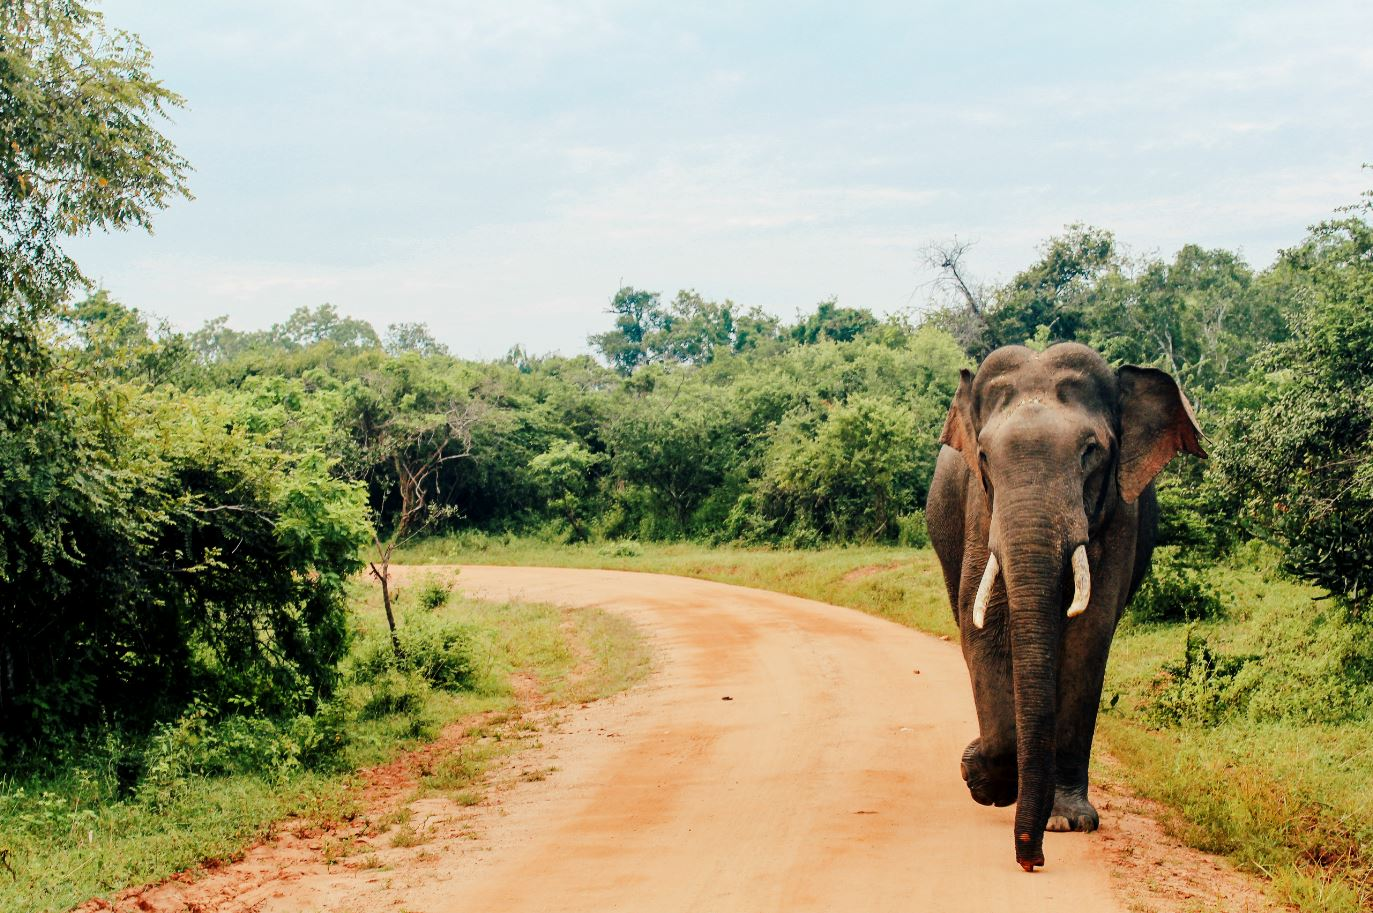 WATCH: Elephant wanders through Sri Lankan hotel